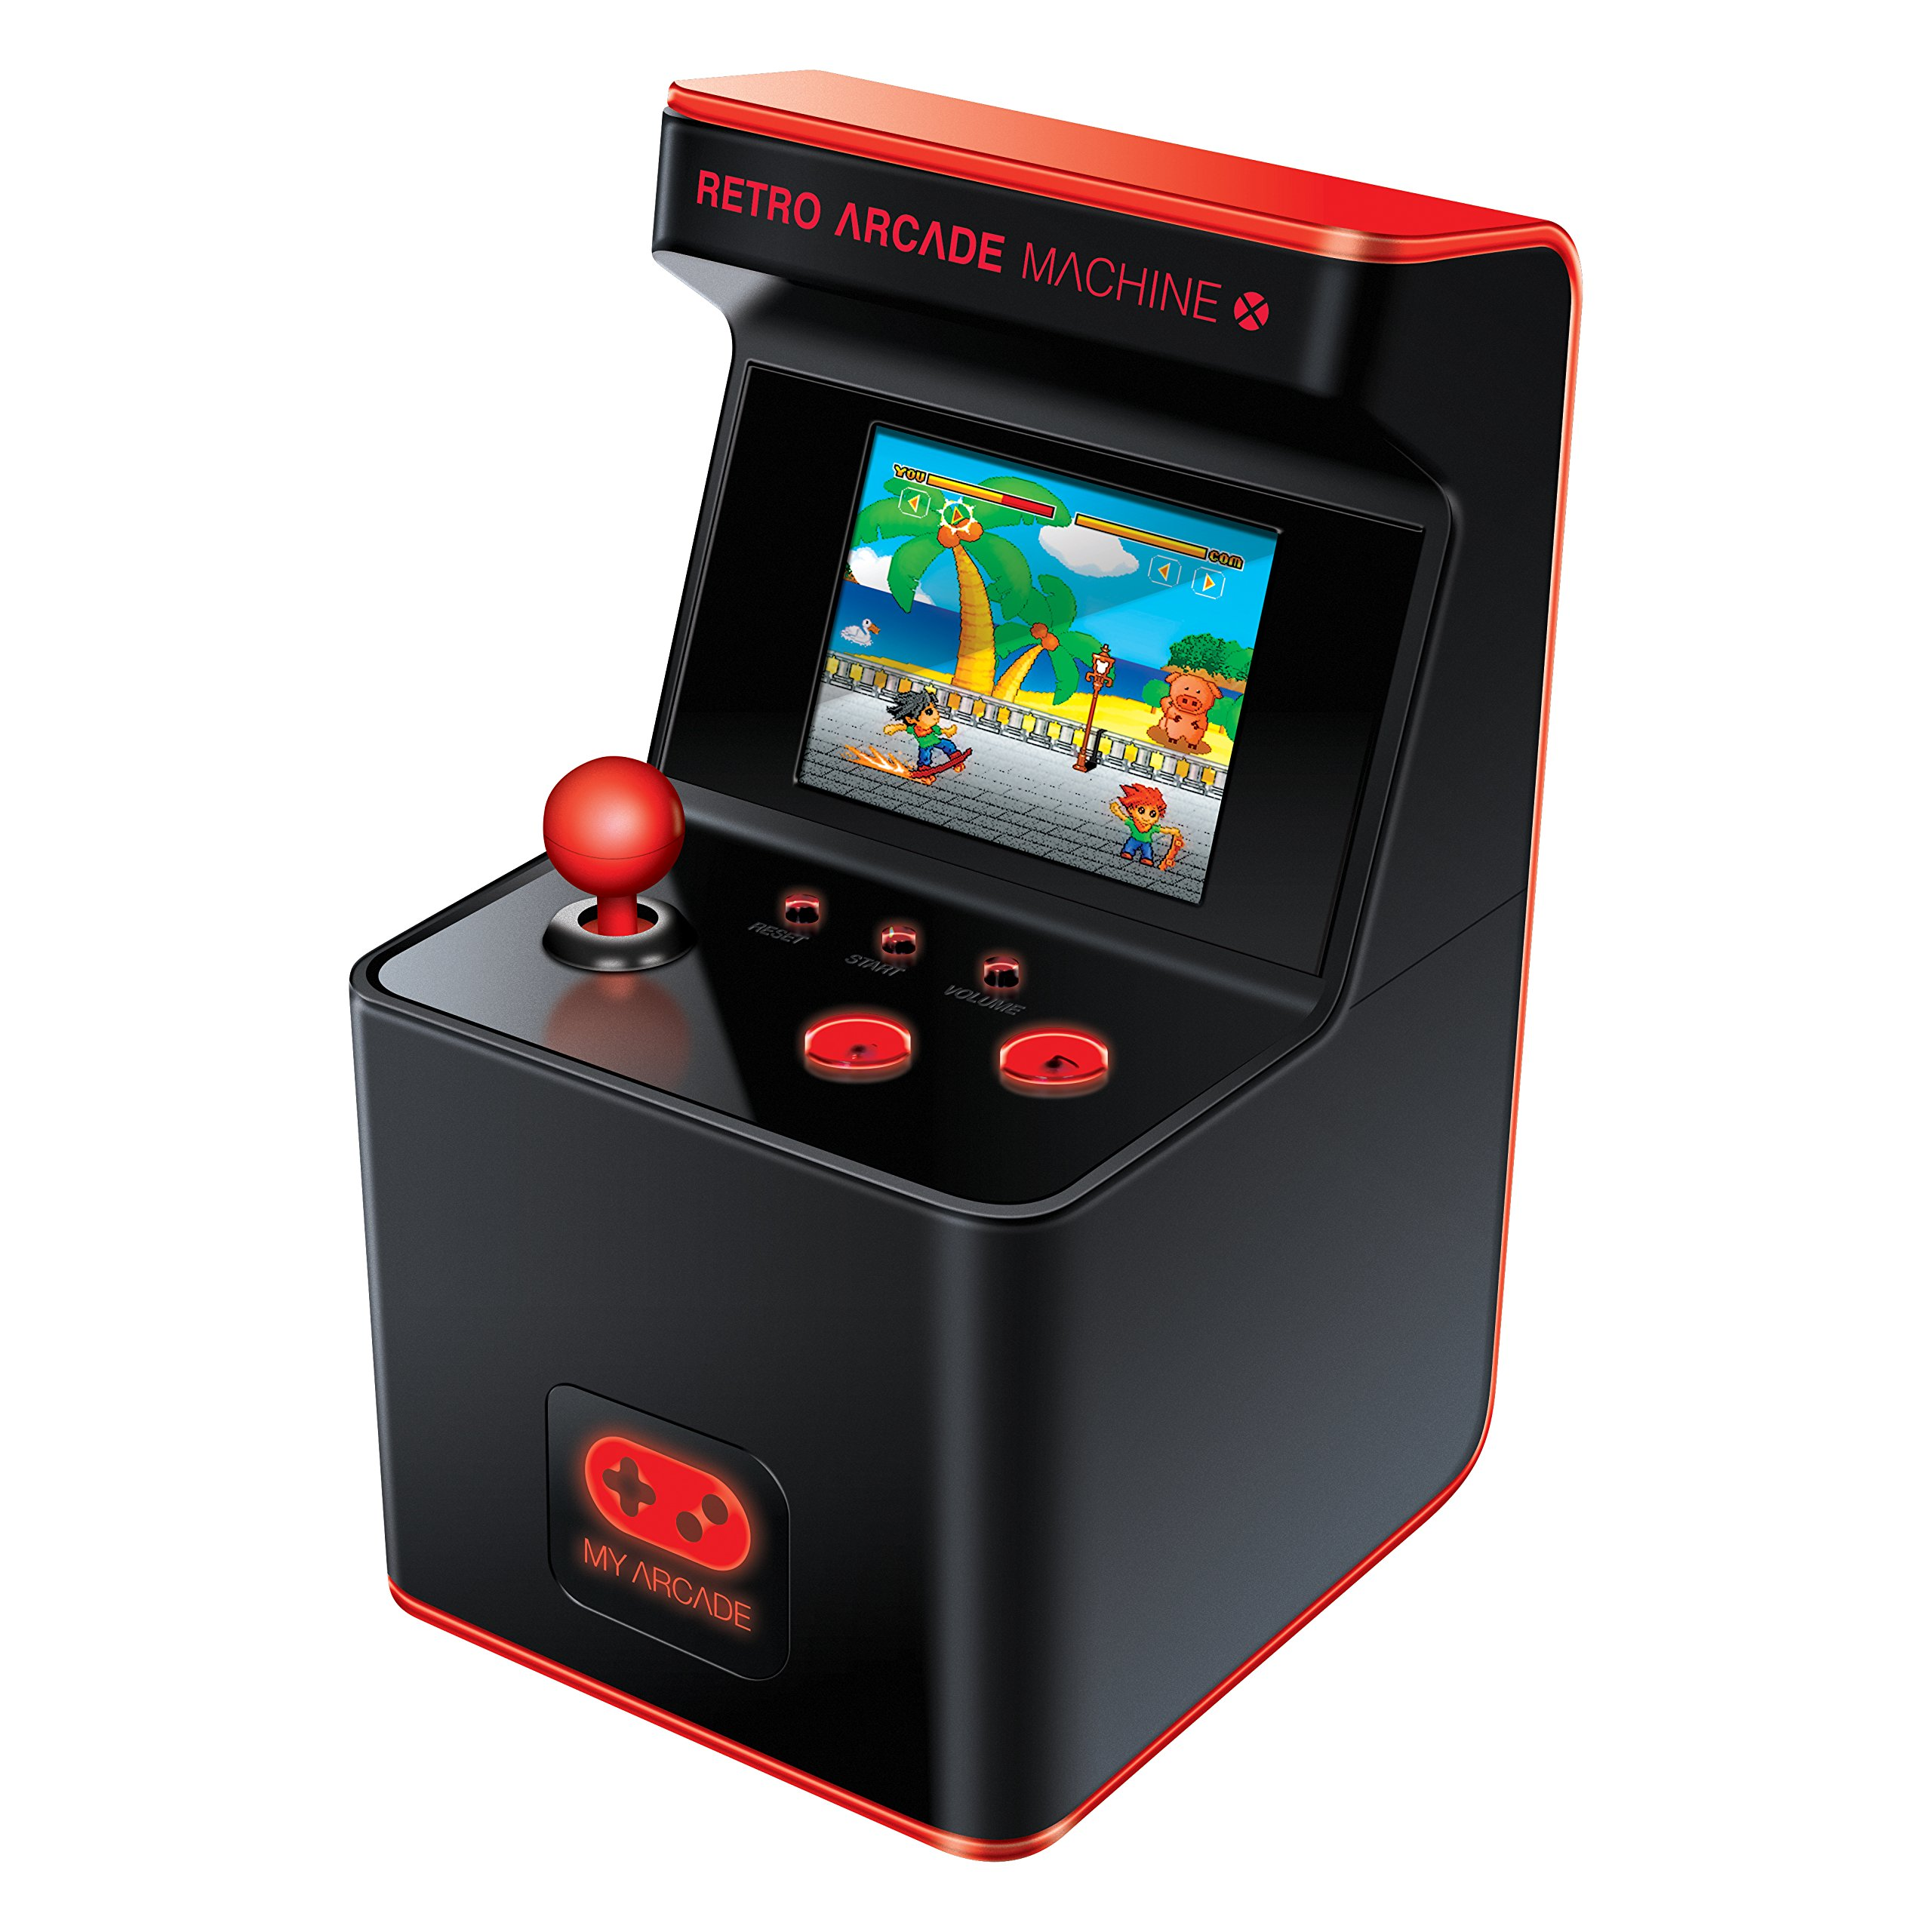 My Arcade - Retro Arcade Machine X Portable Gaming Mini Arcade Cabinet with 300 Built-in Hi-res 16 bit Games